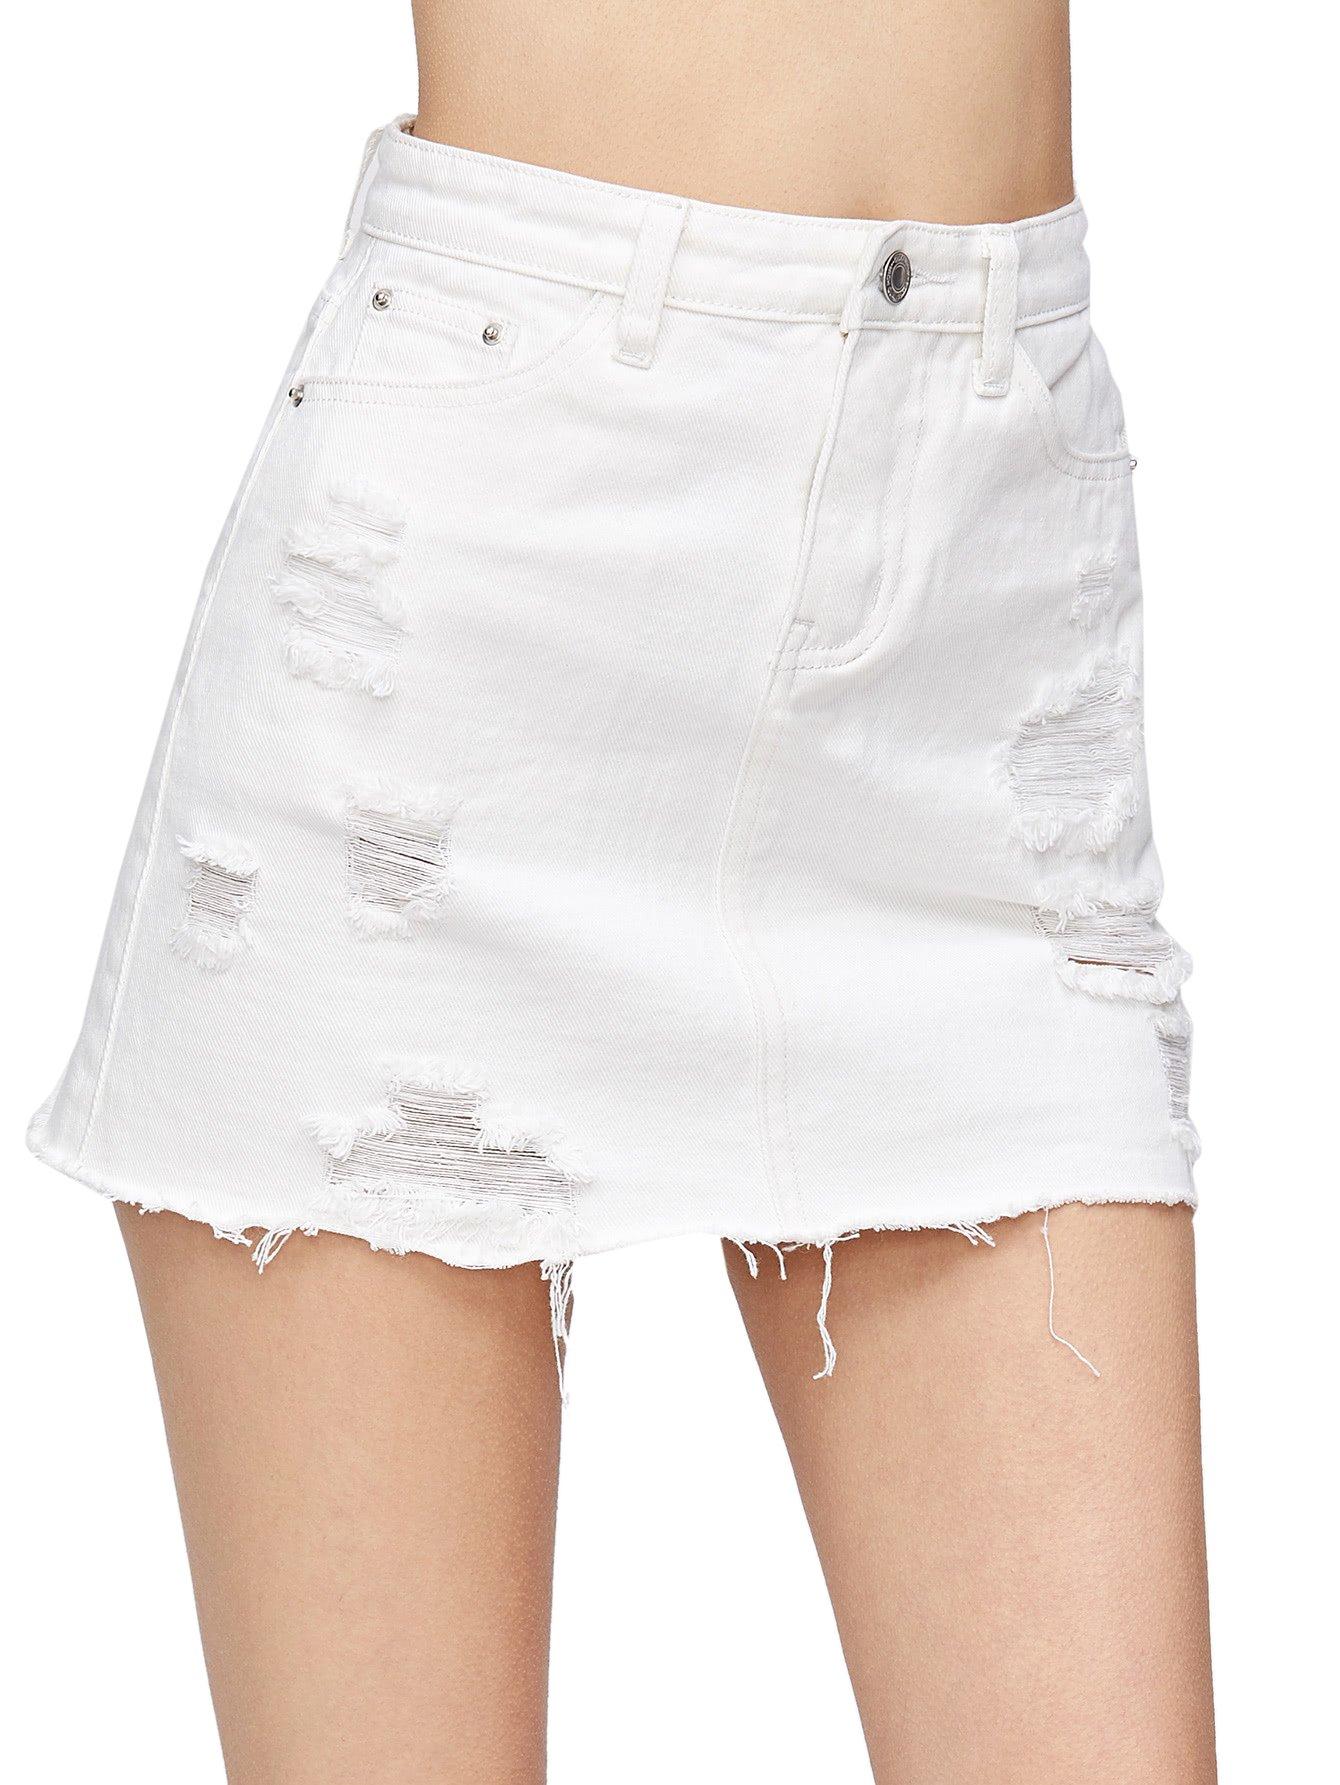 Verdusa Women's Casual Distressed Fray Hem A-Line Denim Short Skirt White S by Verdusa (Image #3)